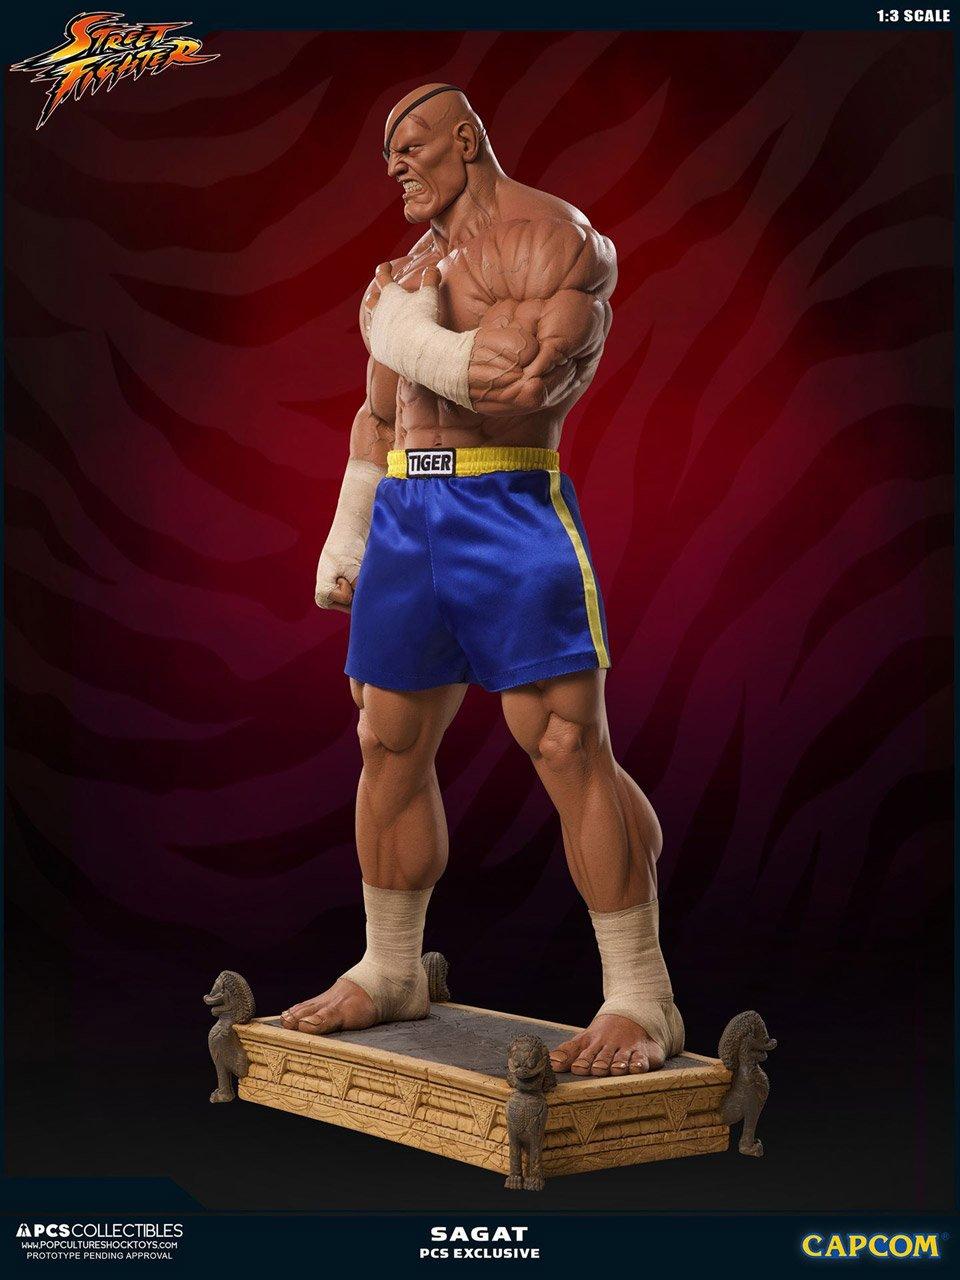 Street Fighter Sagat 1:3 Statue